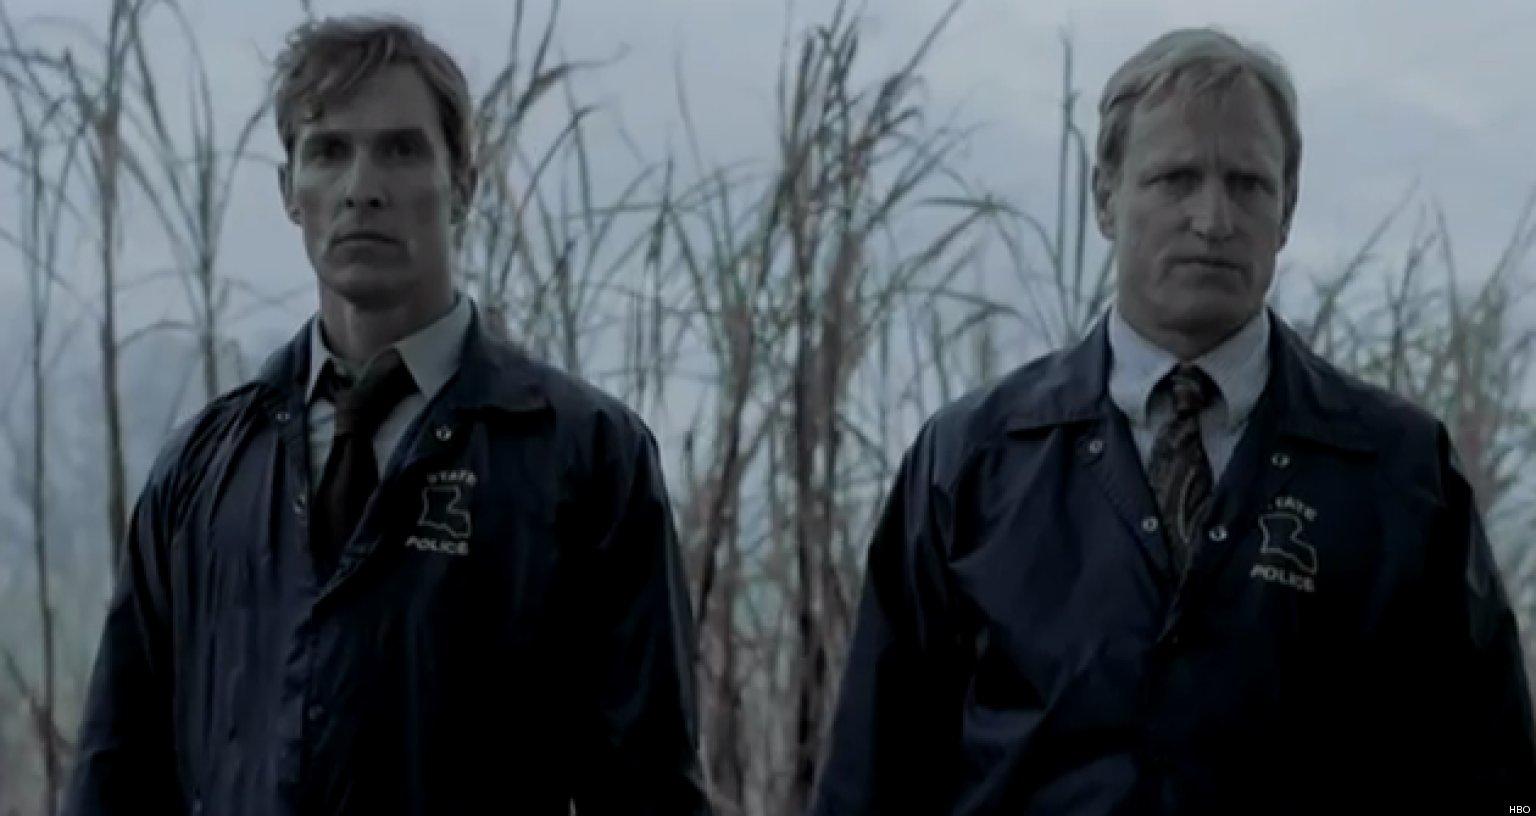 Preferim posar la foto de True Detective que la de Supervivientes a l'espai de TV